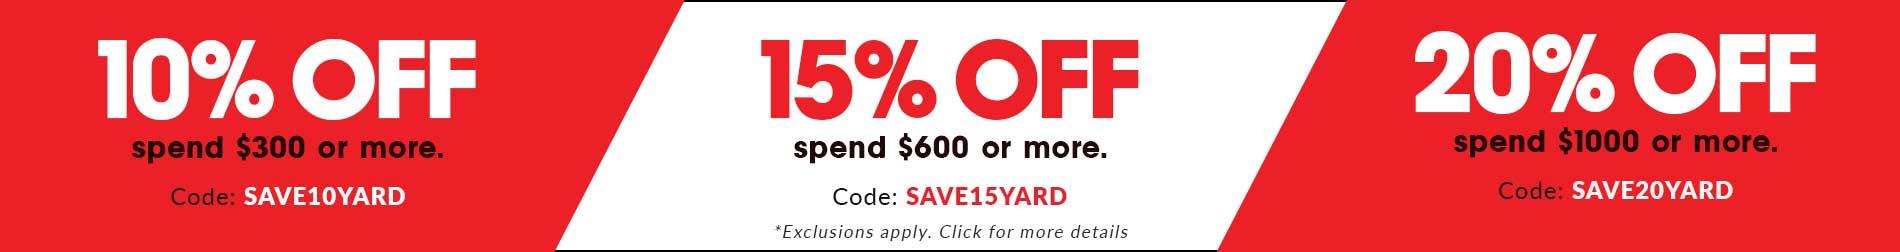 Savings-Breakdown_YardLetters-Symbols_1900x292-Exclusions